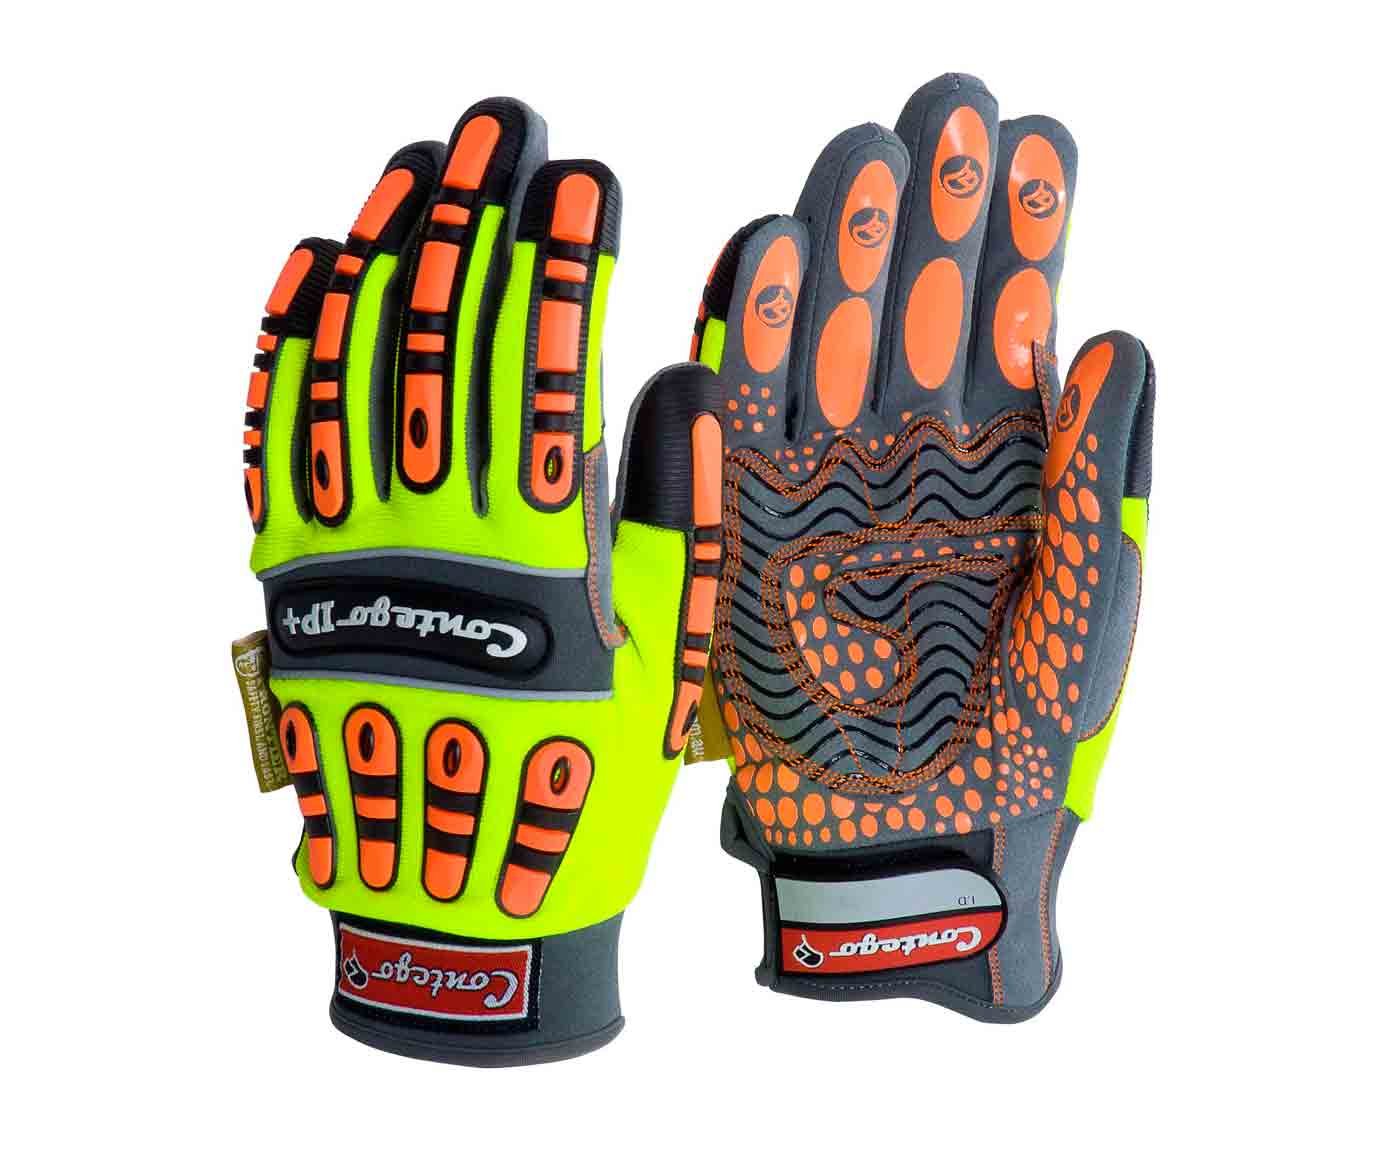 Contego Impact Protection Hi Vis Mechanics Work Gloves IP+ P8274HV